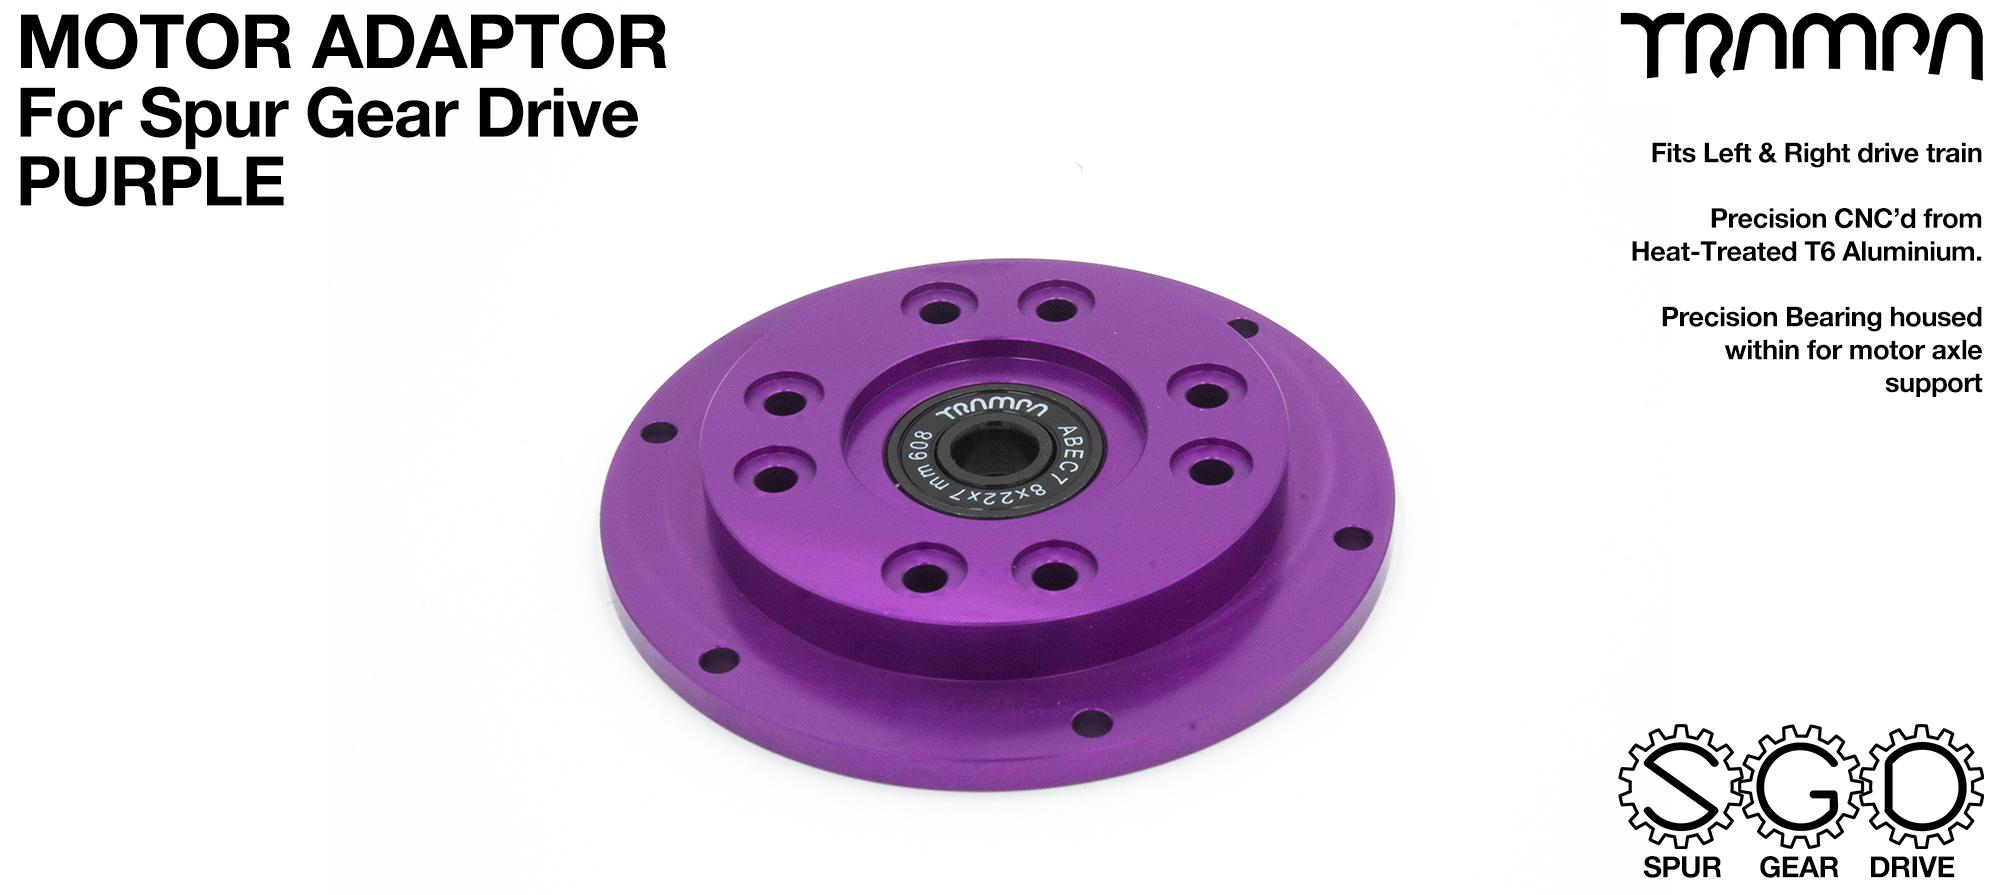 MkII Spur Gear Drive Motor Adaptor PURPLE